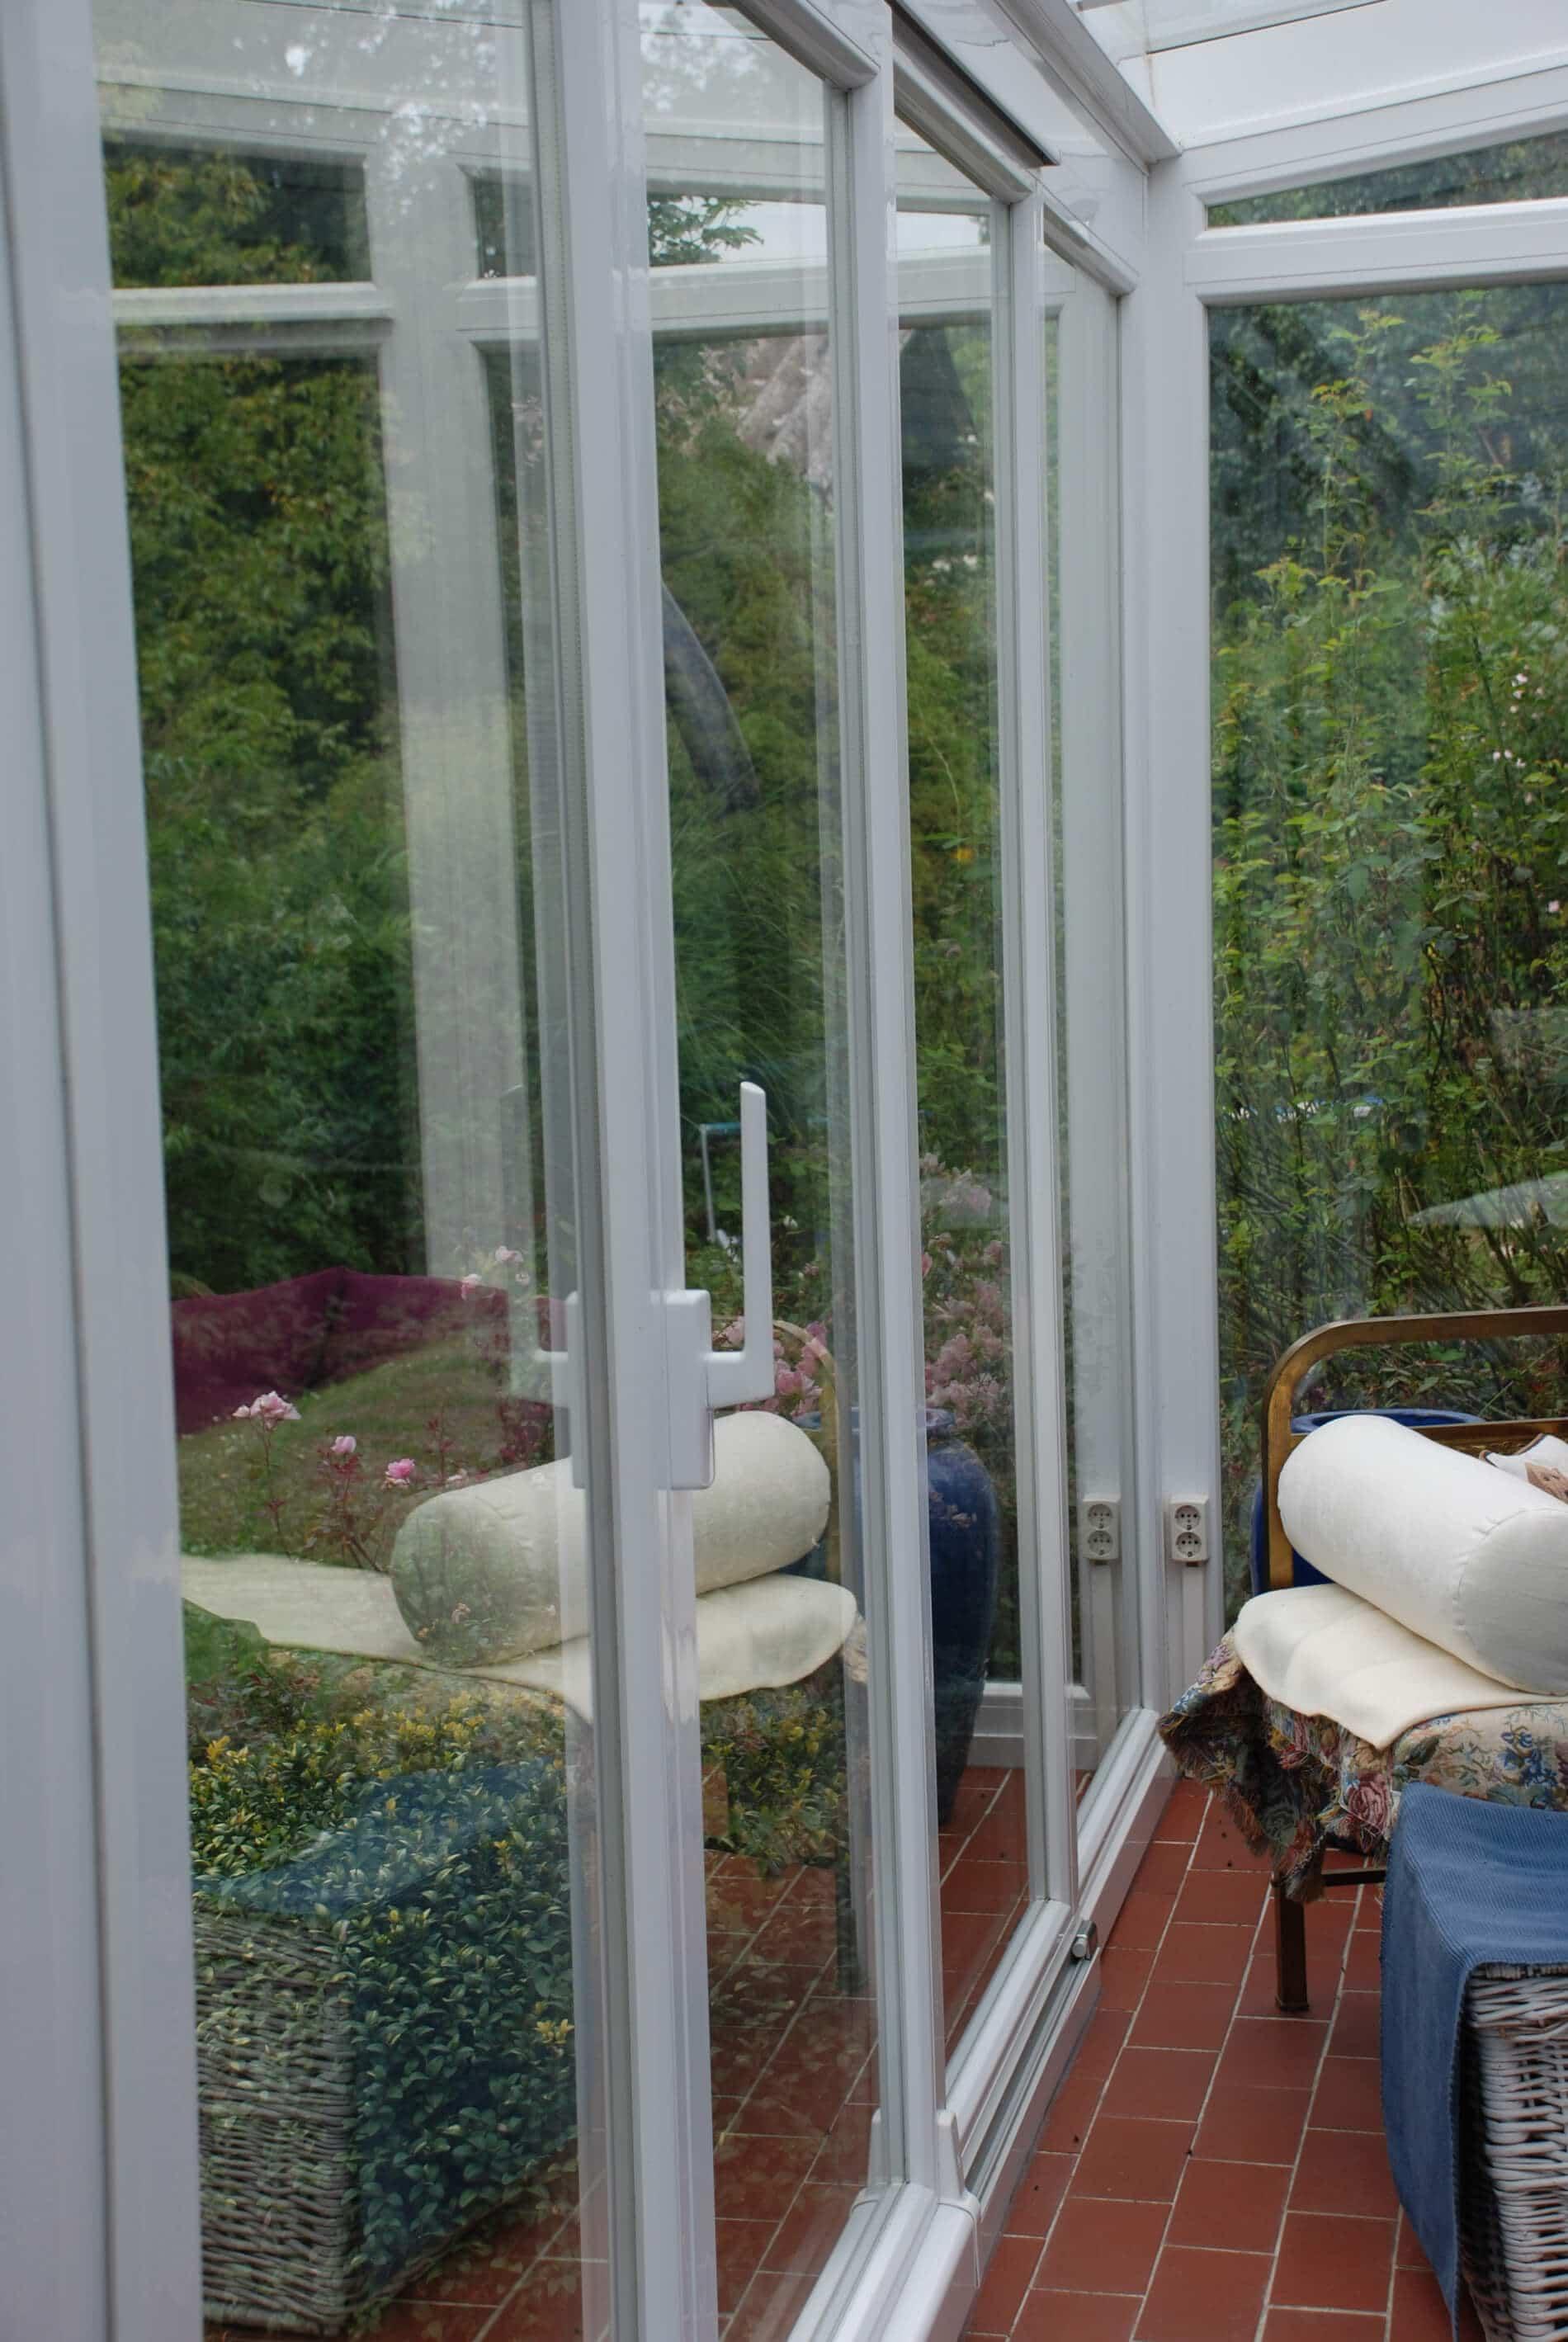 glasschiebewand terrasse verglasung aussen wintergarten schmidinger. Black Bedroom Furniture Sets. Home Design Ideas